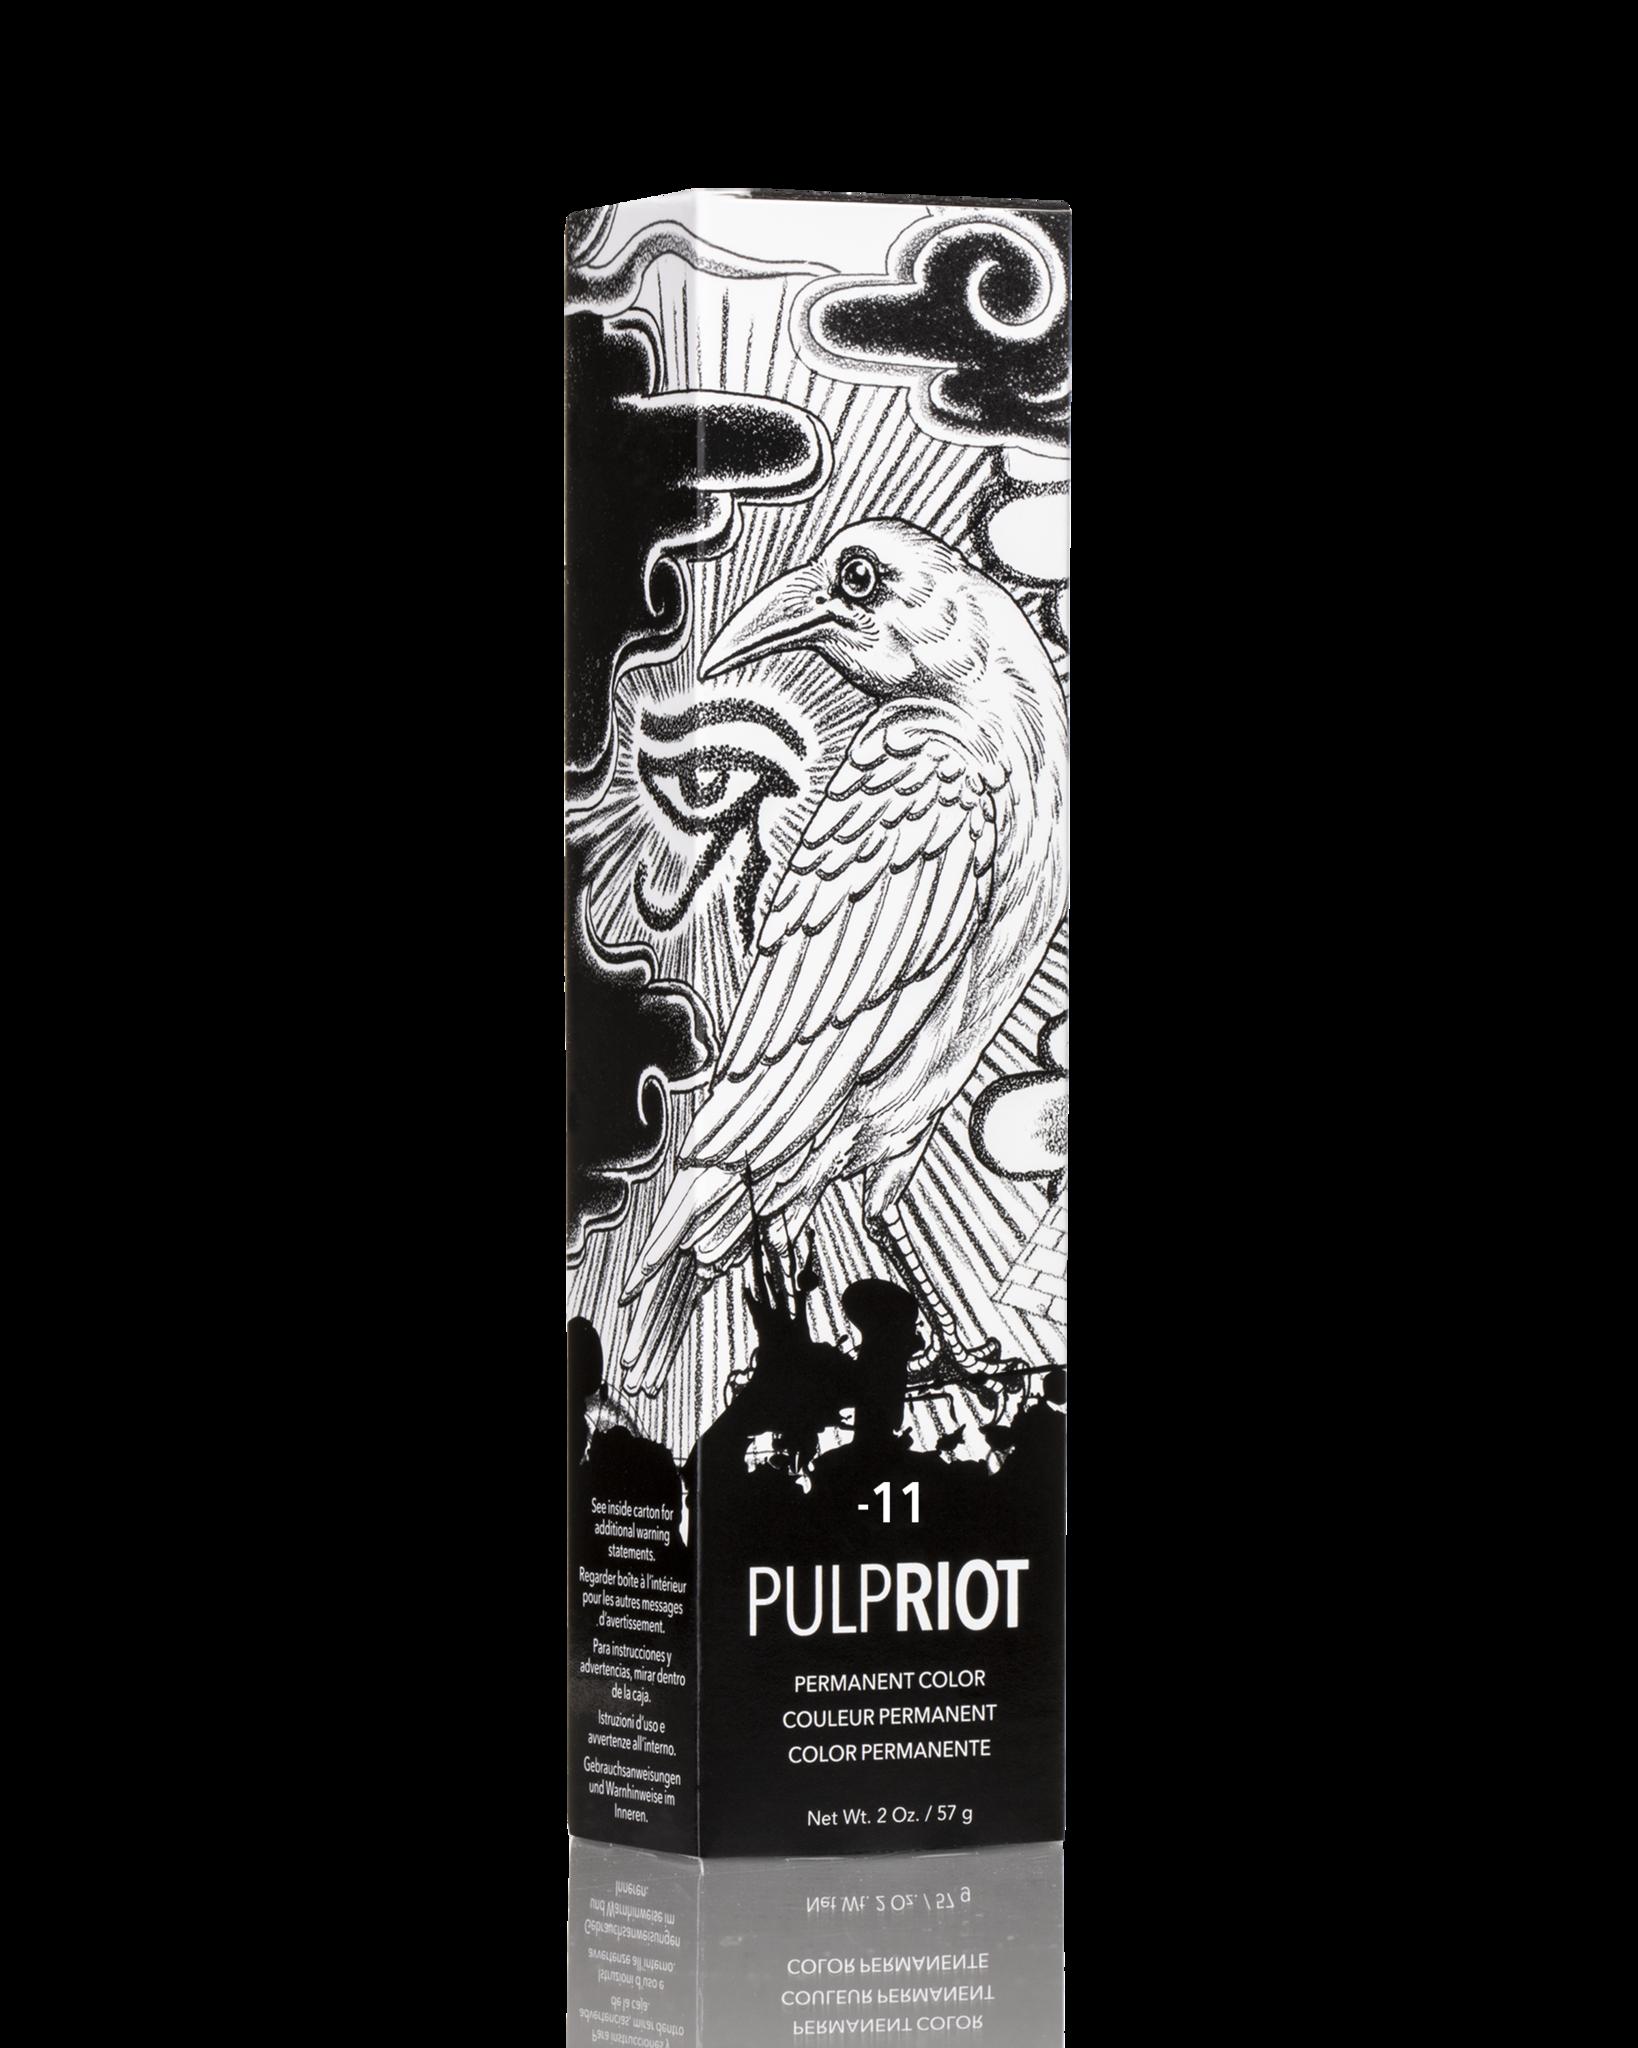 Pulp Riot PULP RIOT FACTION 8 BOOSTER -11